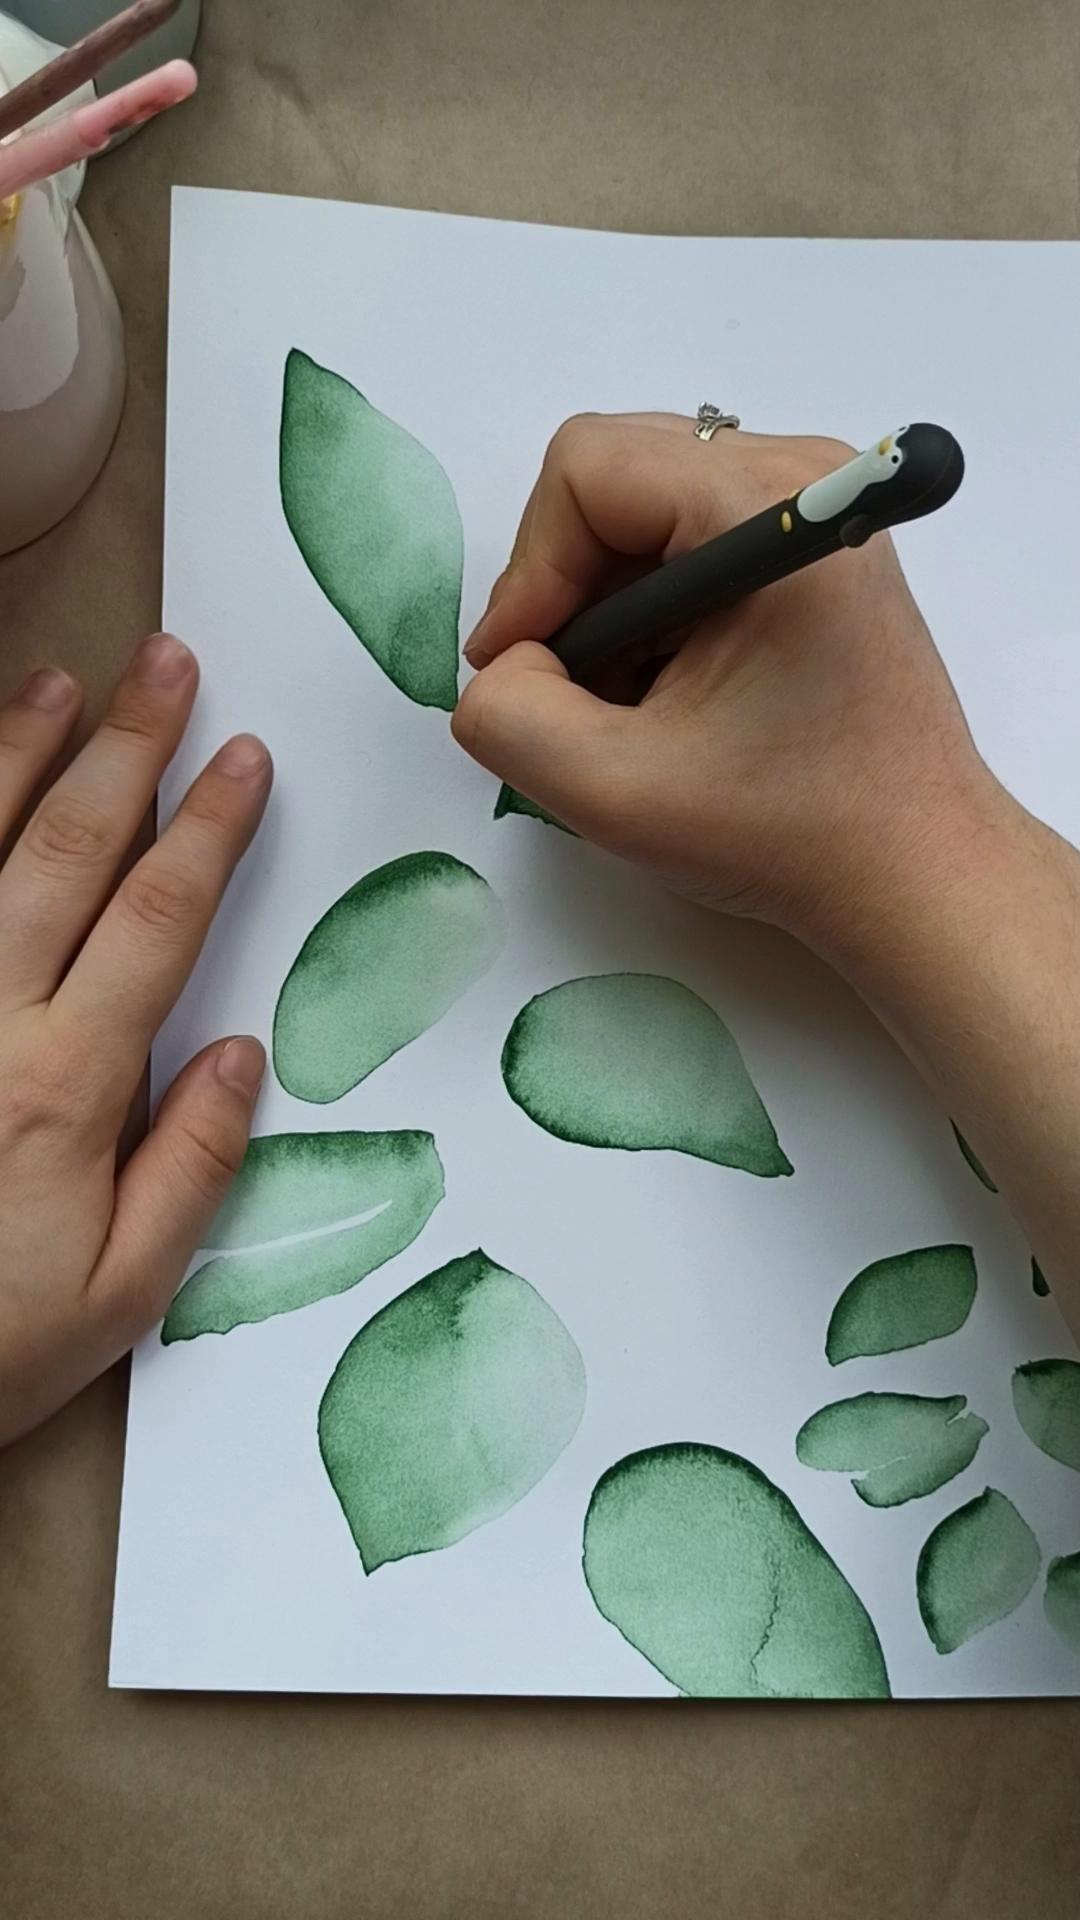 Extraordinaire  Mot-Clé Easy plants art, watercolor art ideas, line drawing, art tutorial, ideas painting, easy drawing